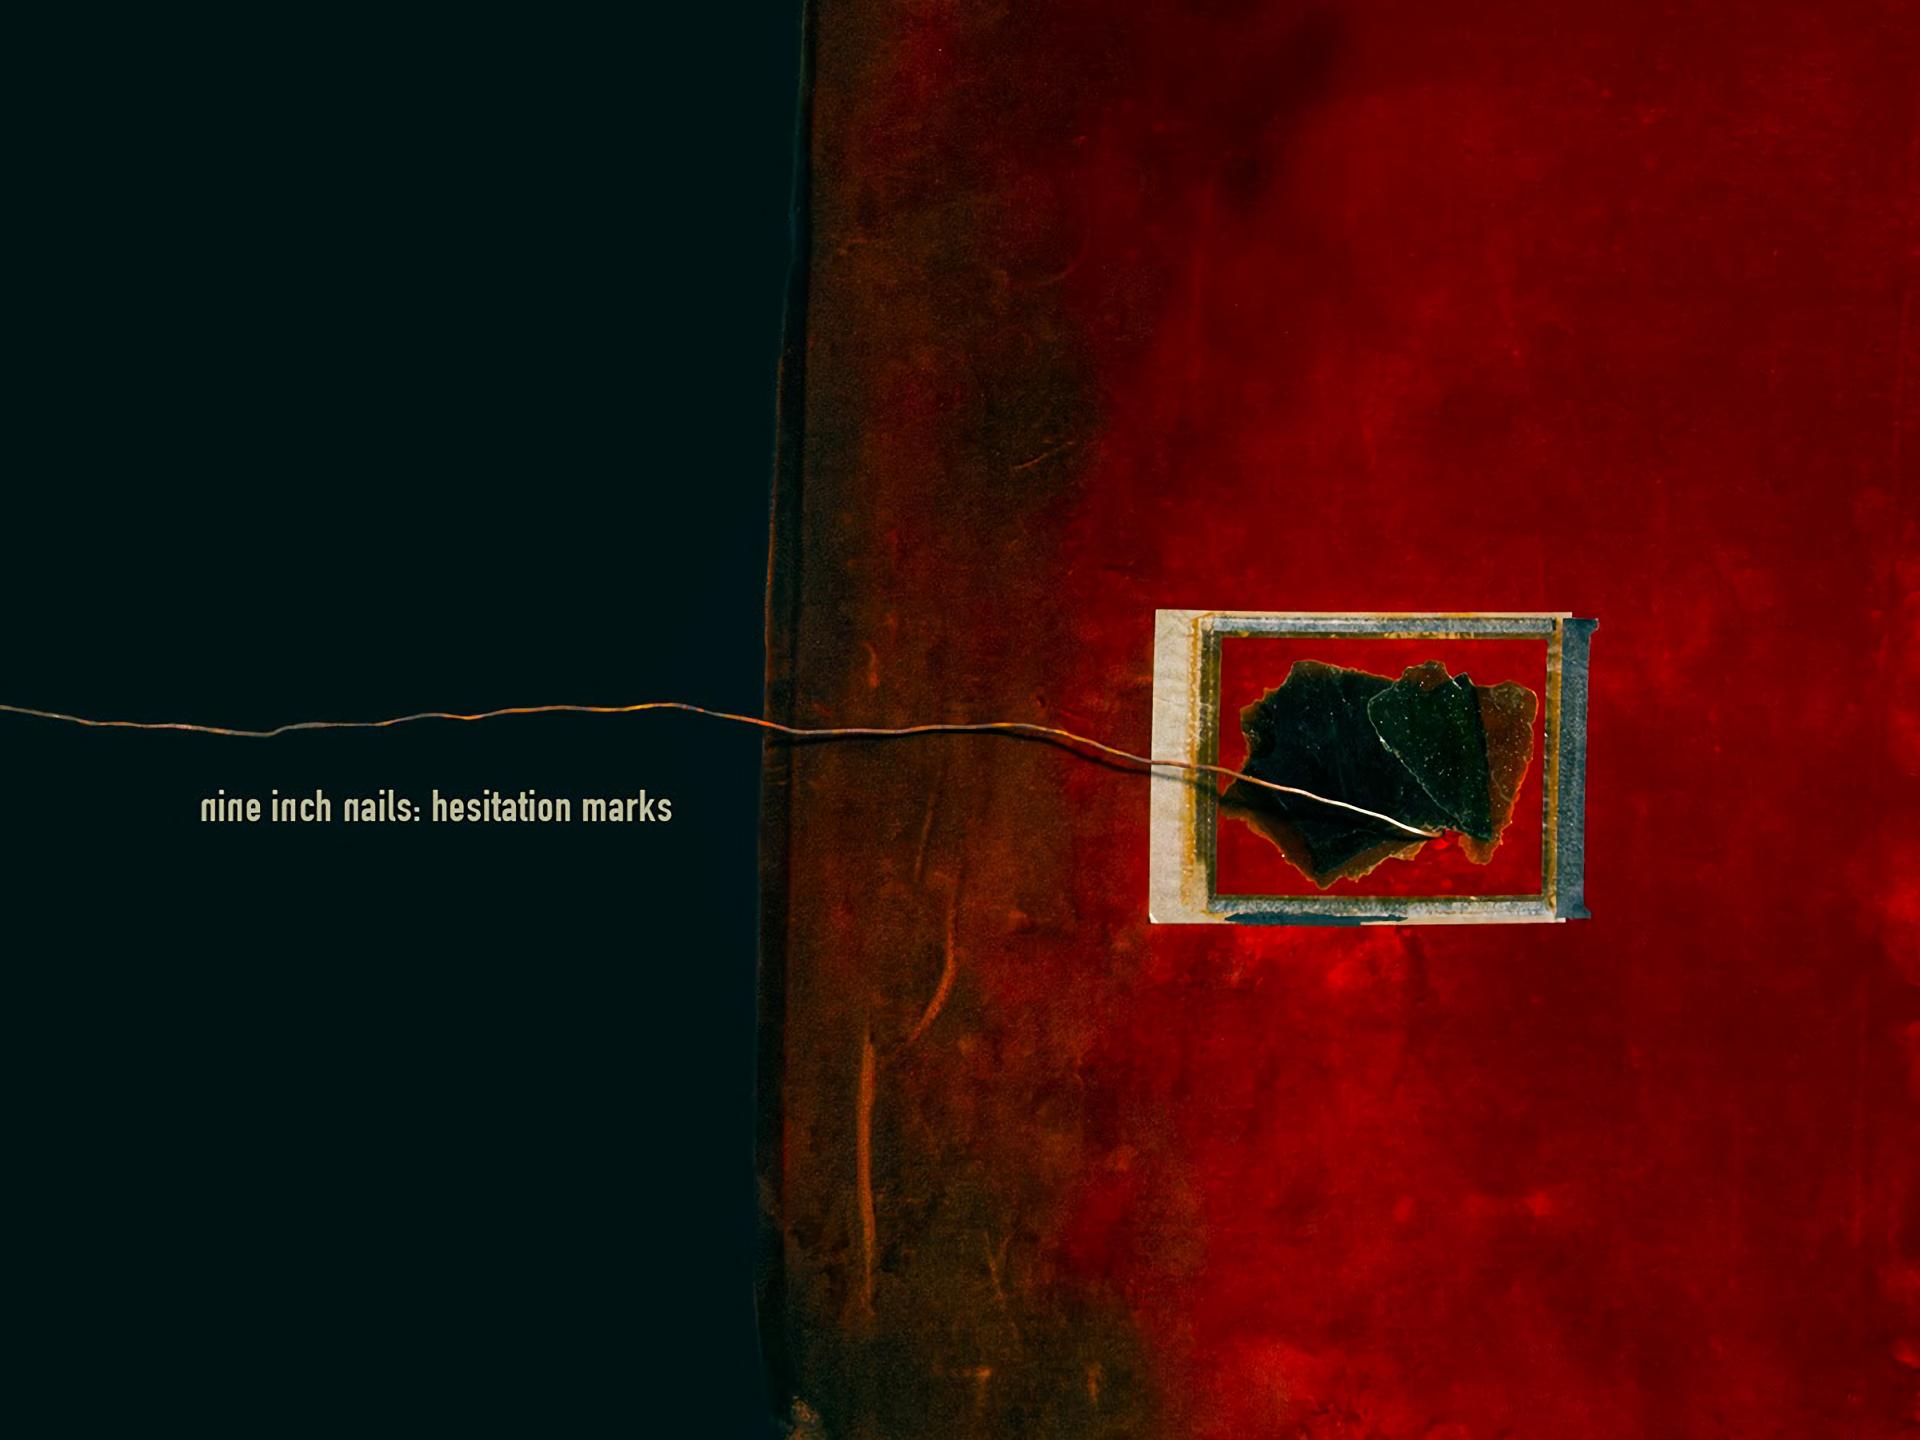 Hesitation Marks Wallpaper Nine Inch Nails: Hesit...